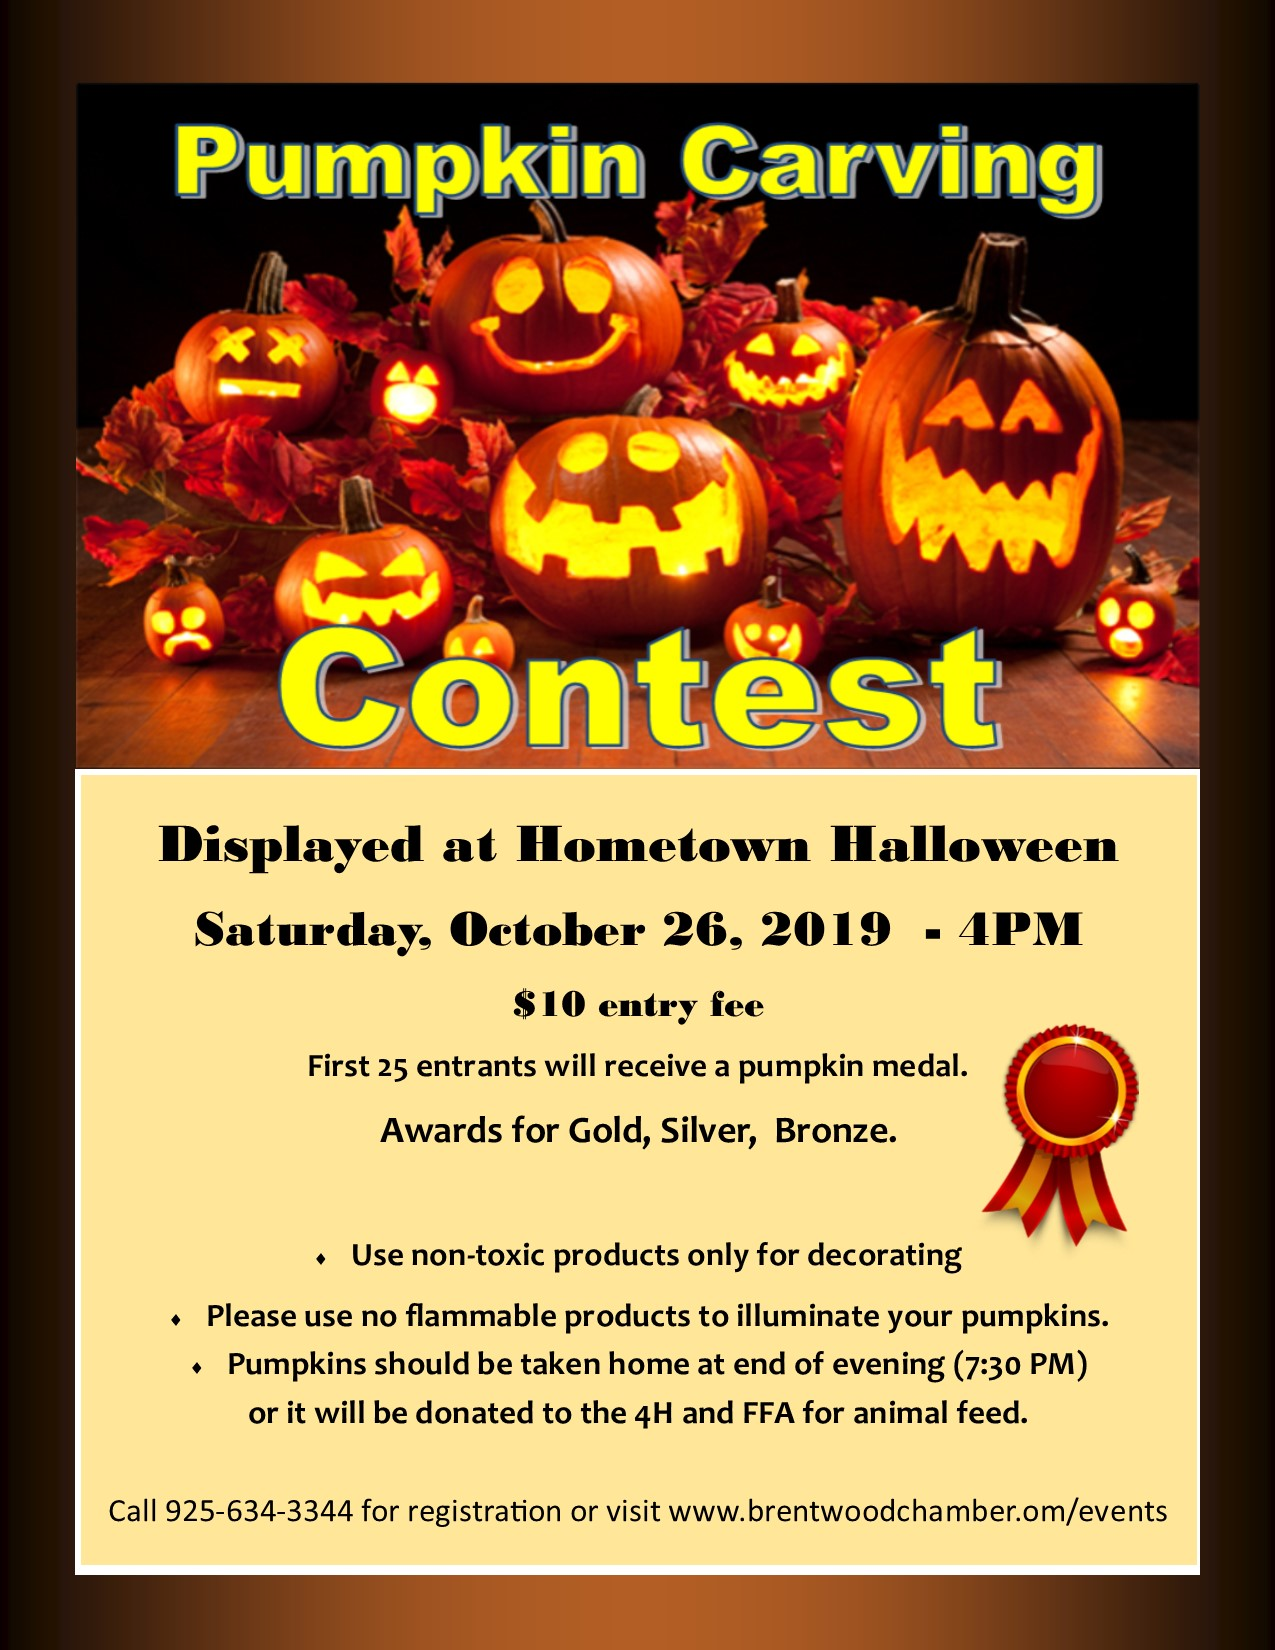 pumpkin-carving-contest-flyer.jpg